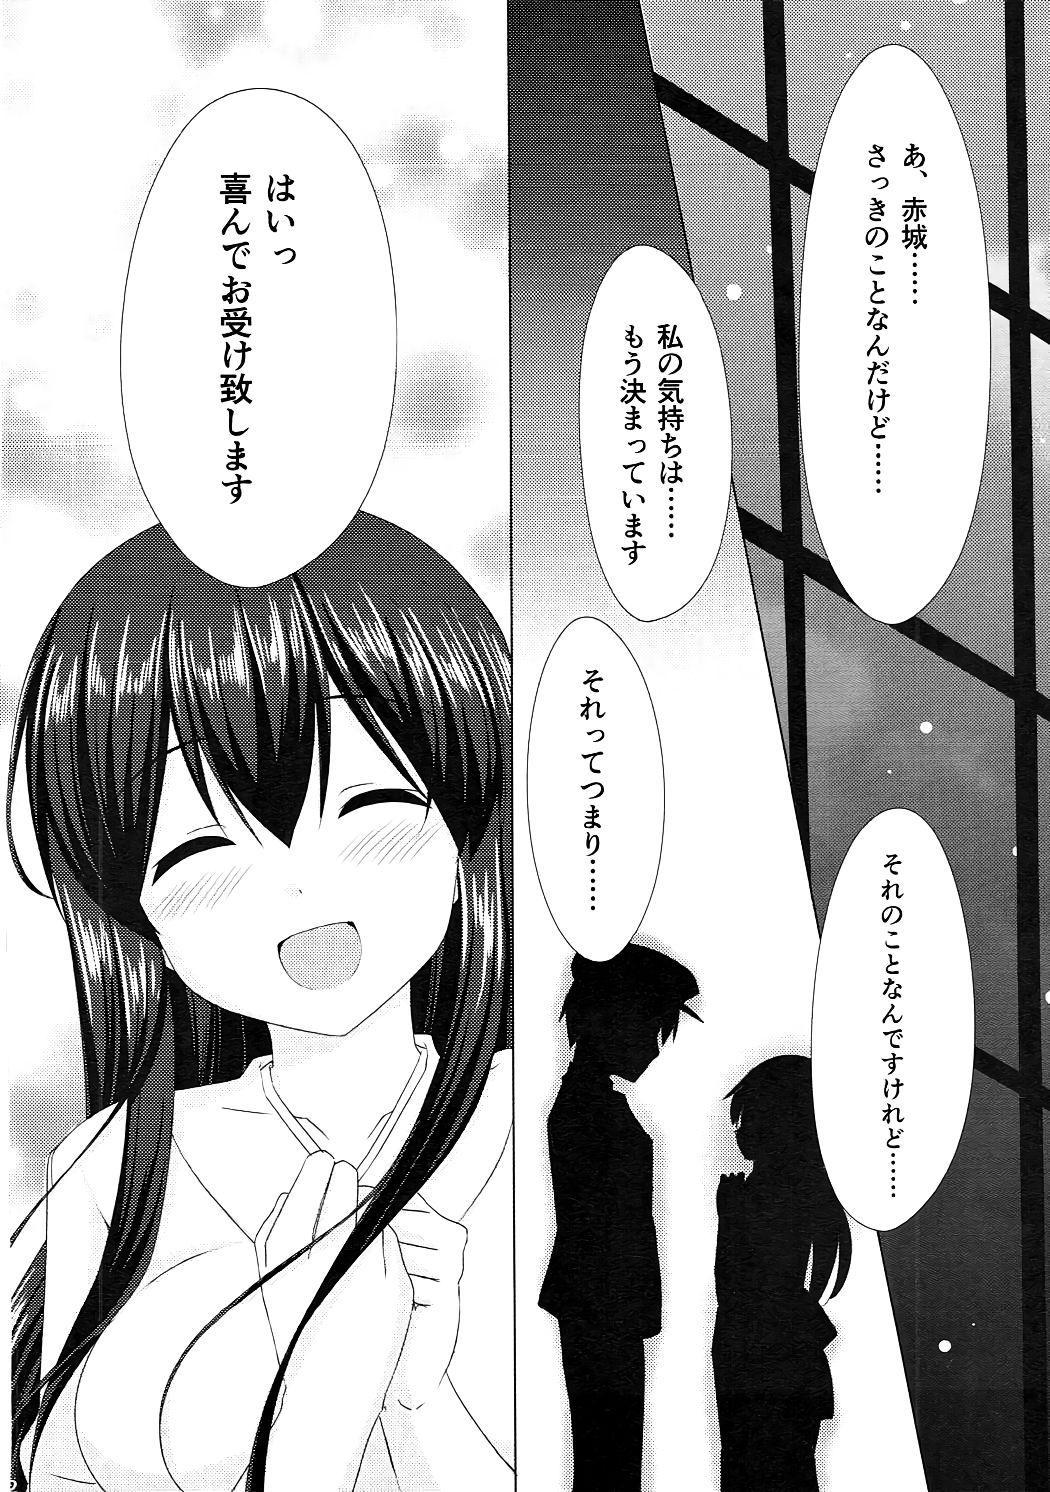 Akagi-san to Kekkon Kakko Kari 20